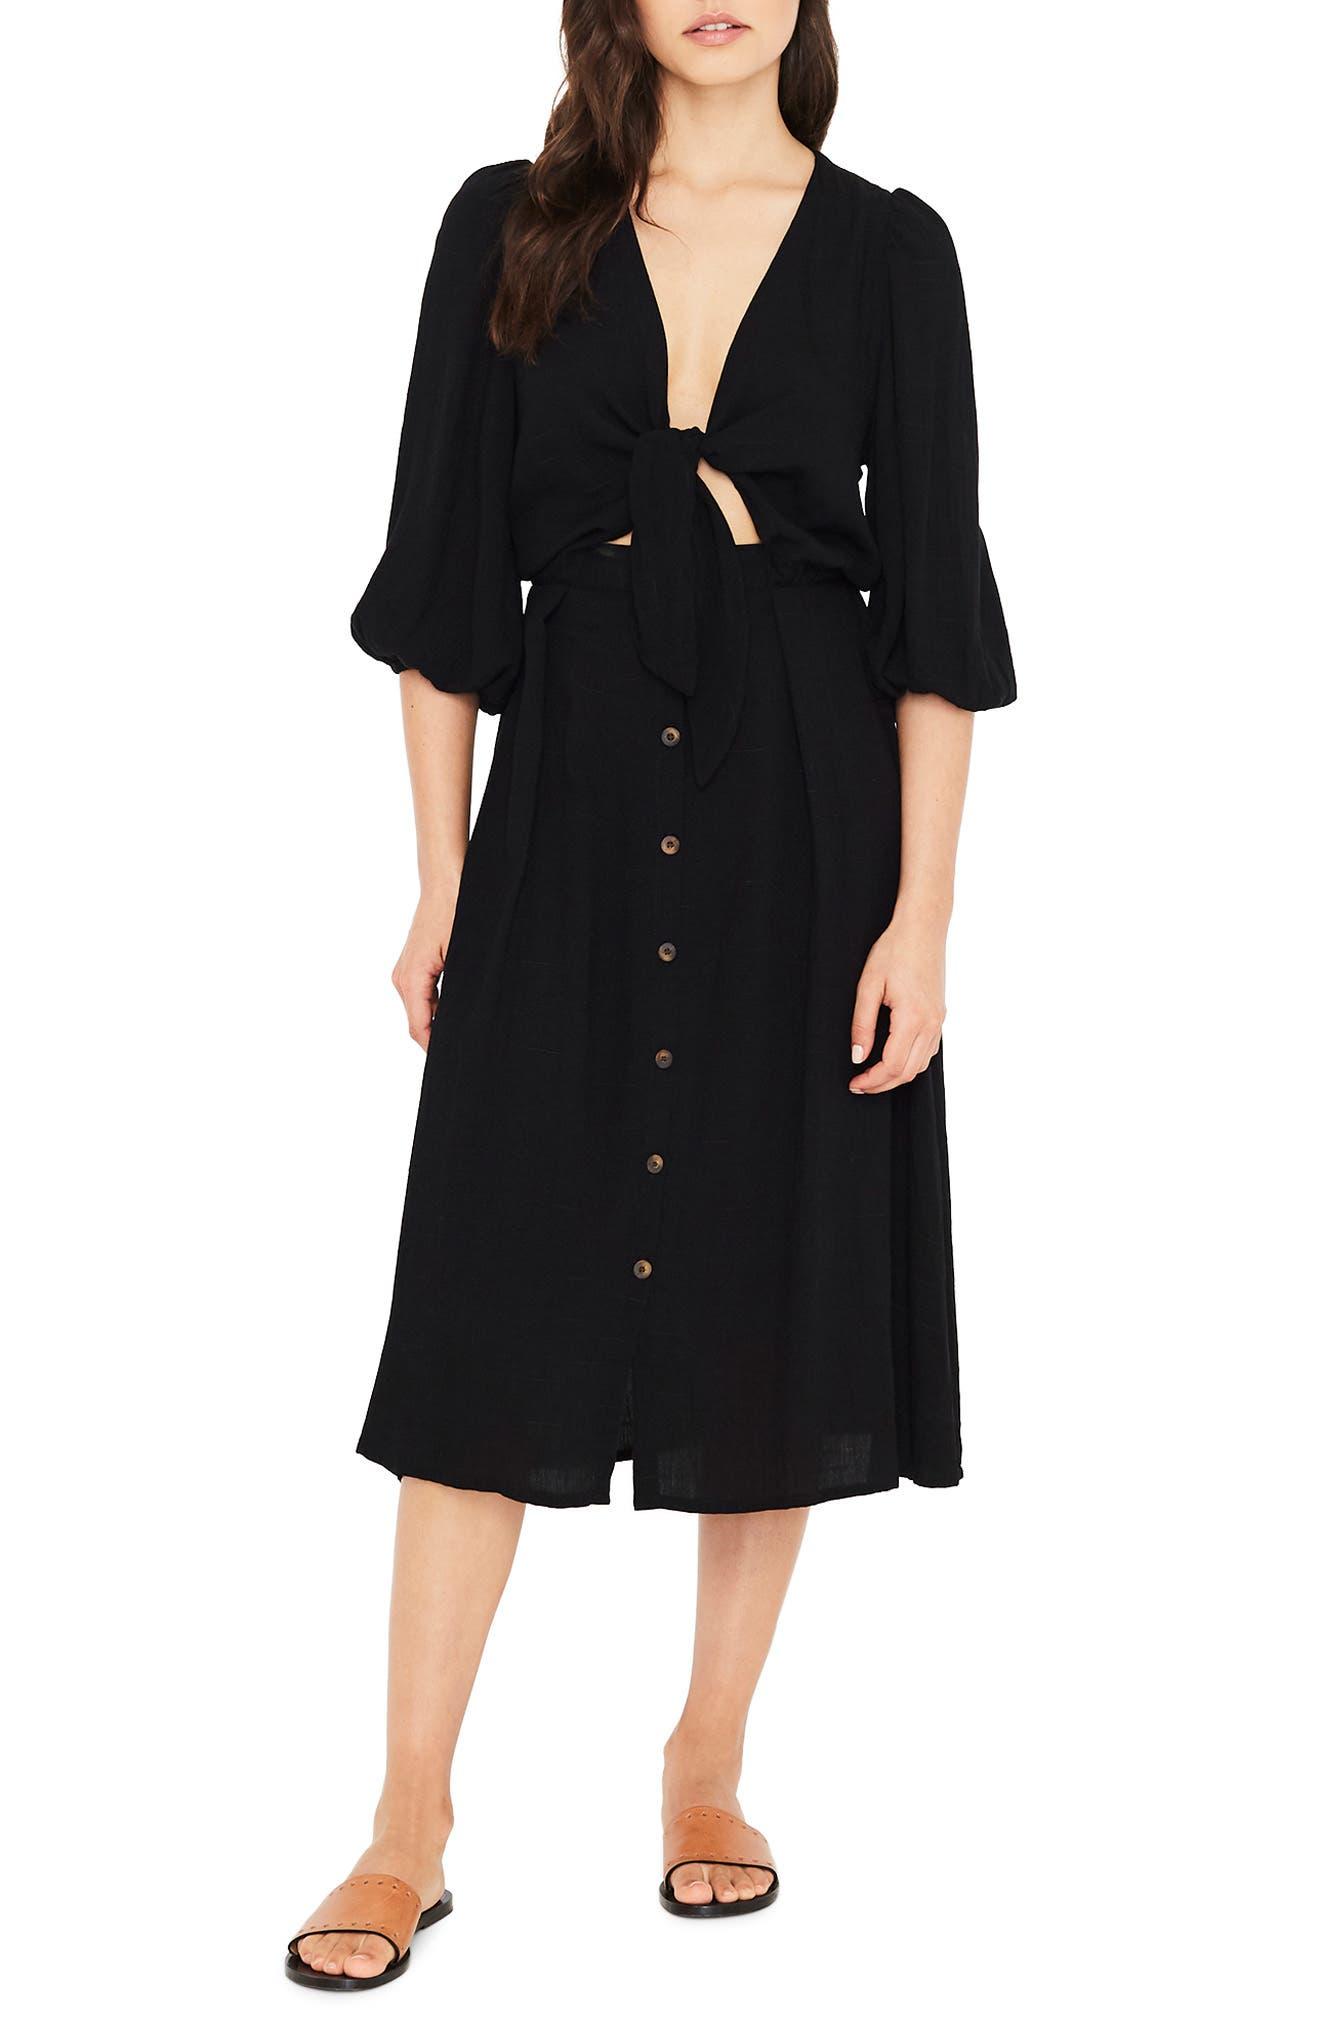 Tobago Tie Front Midi Dress,                         Main,                         color, PLAIN BLACK